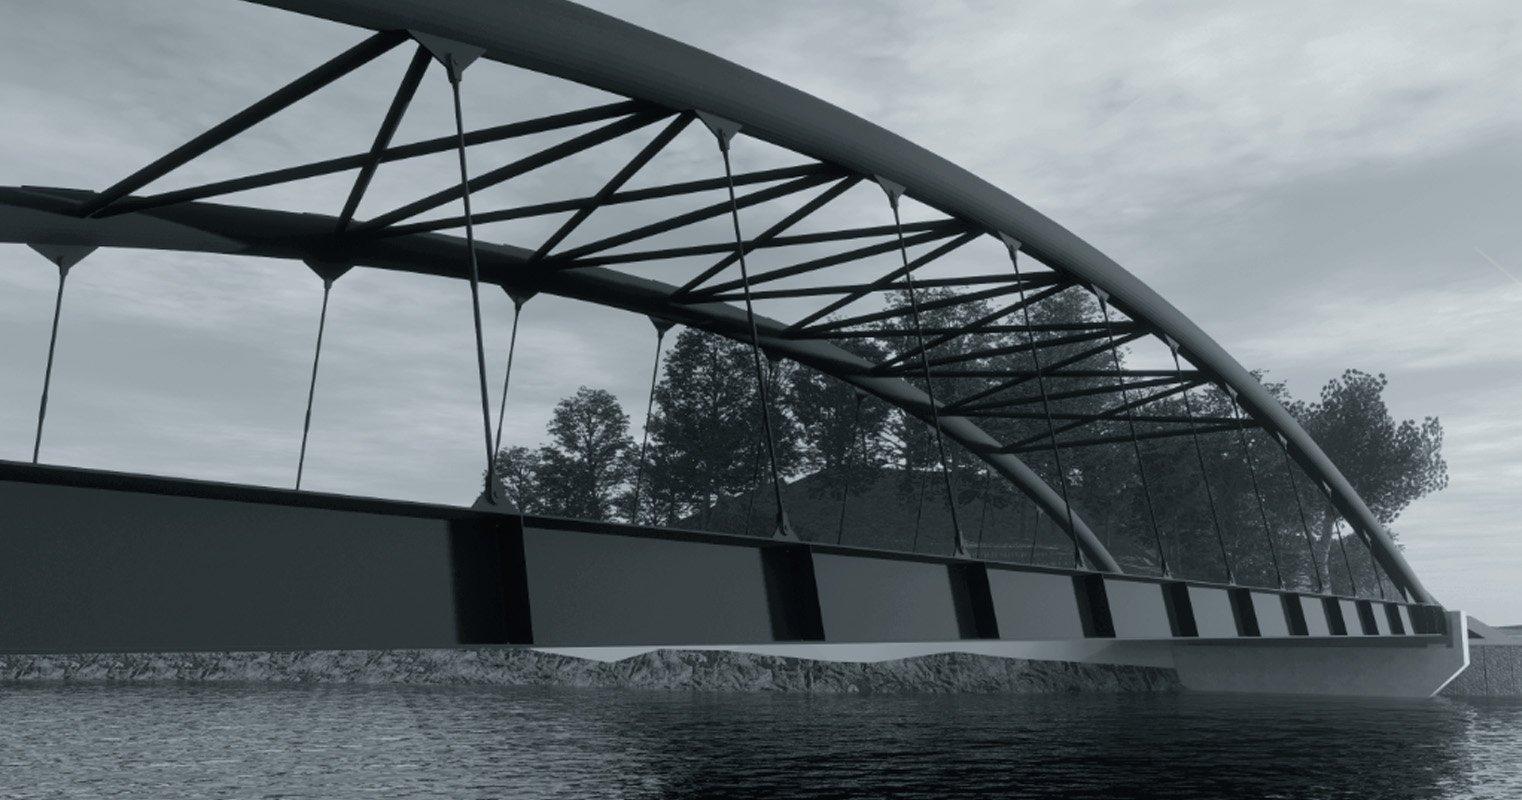 ponte di barcis envision italia architettura ingegneria servizi